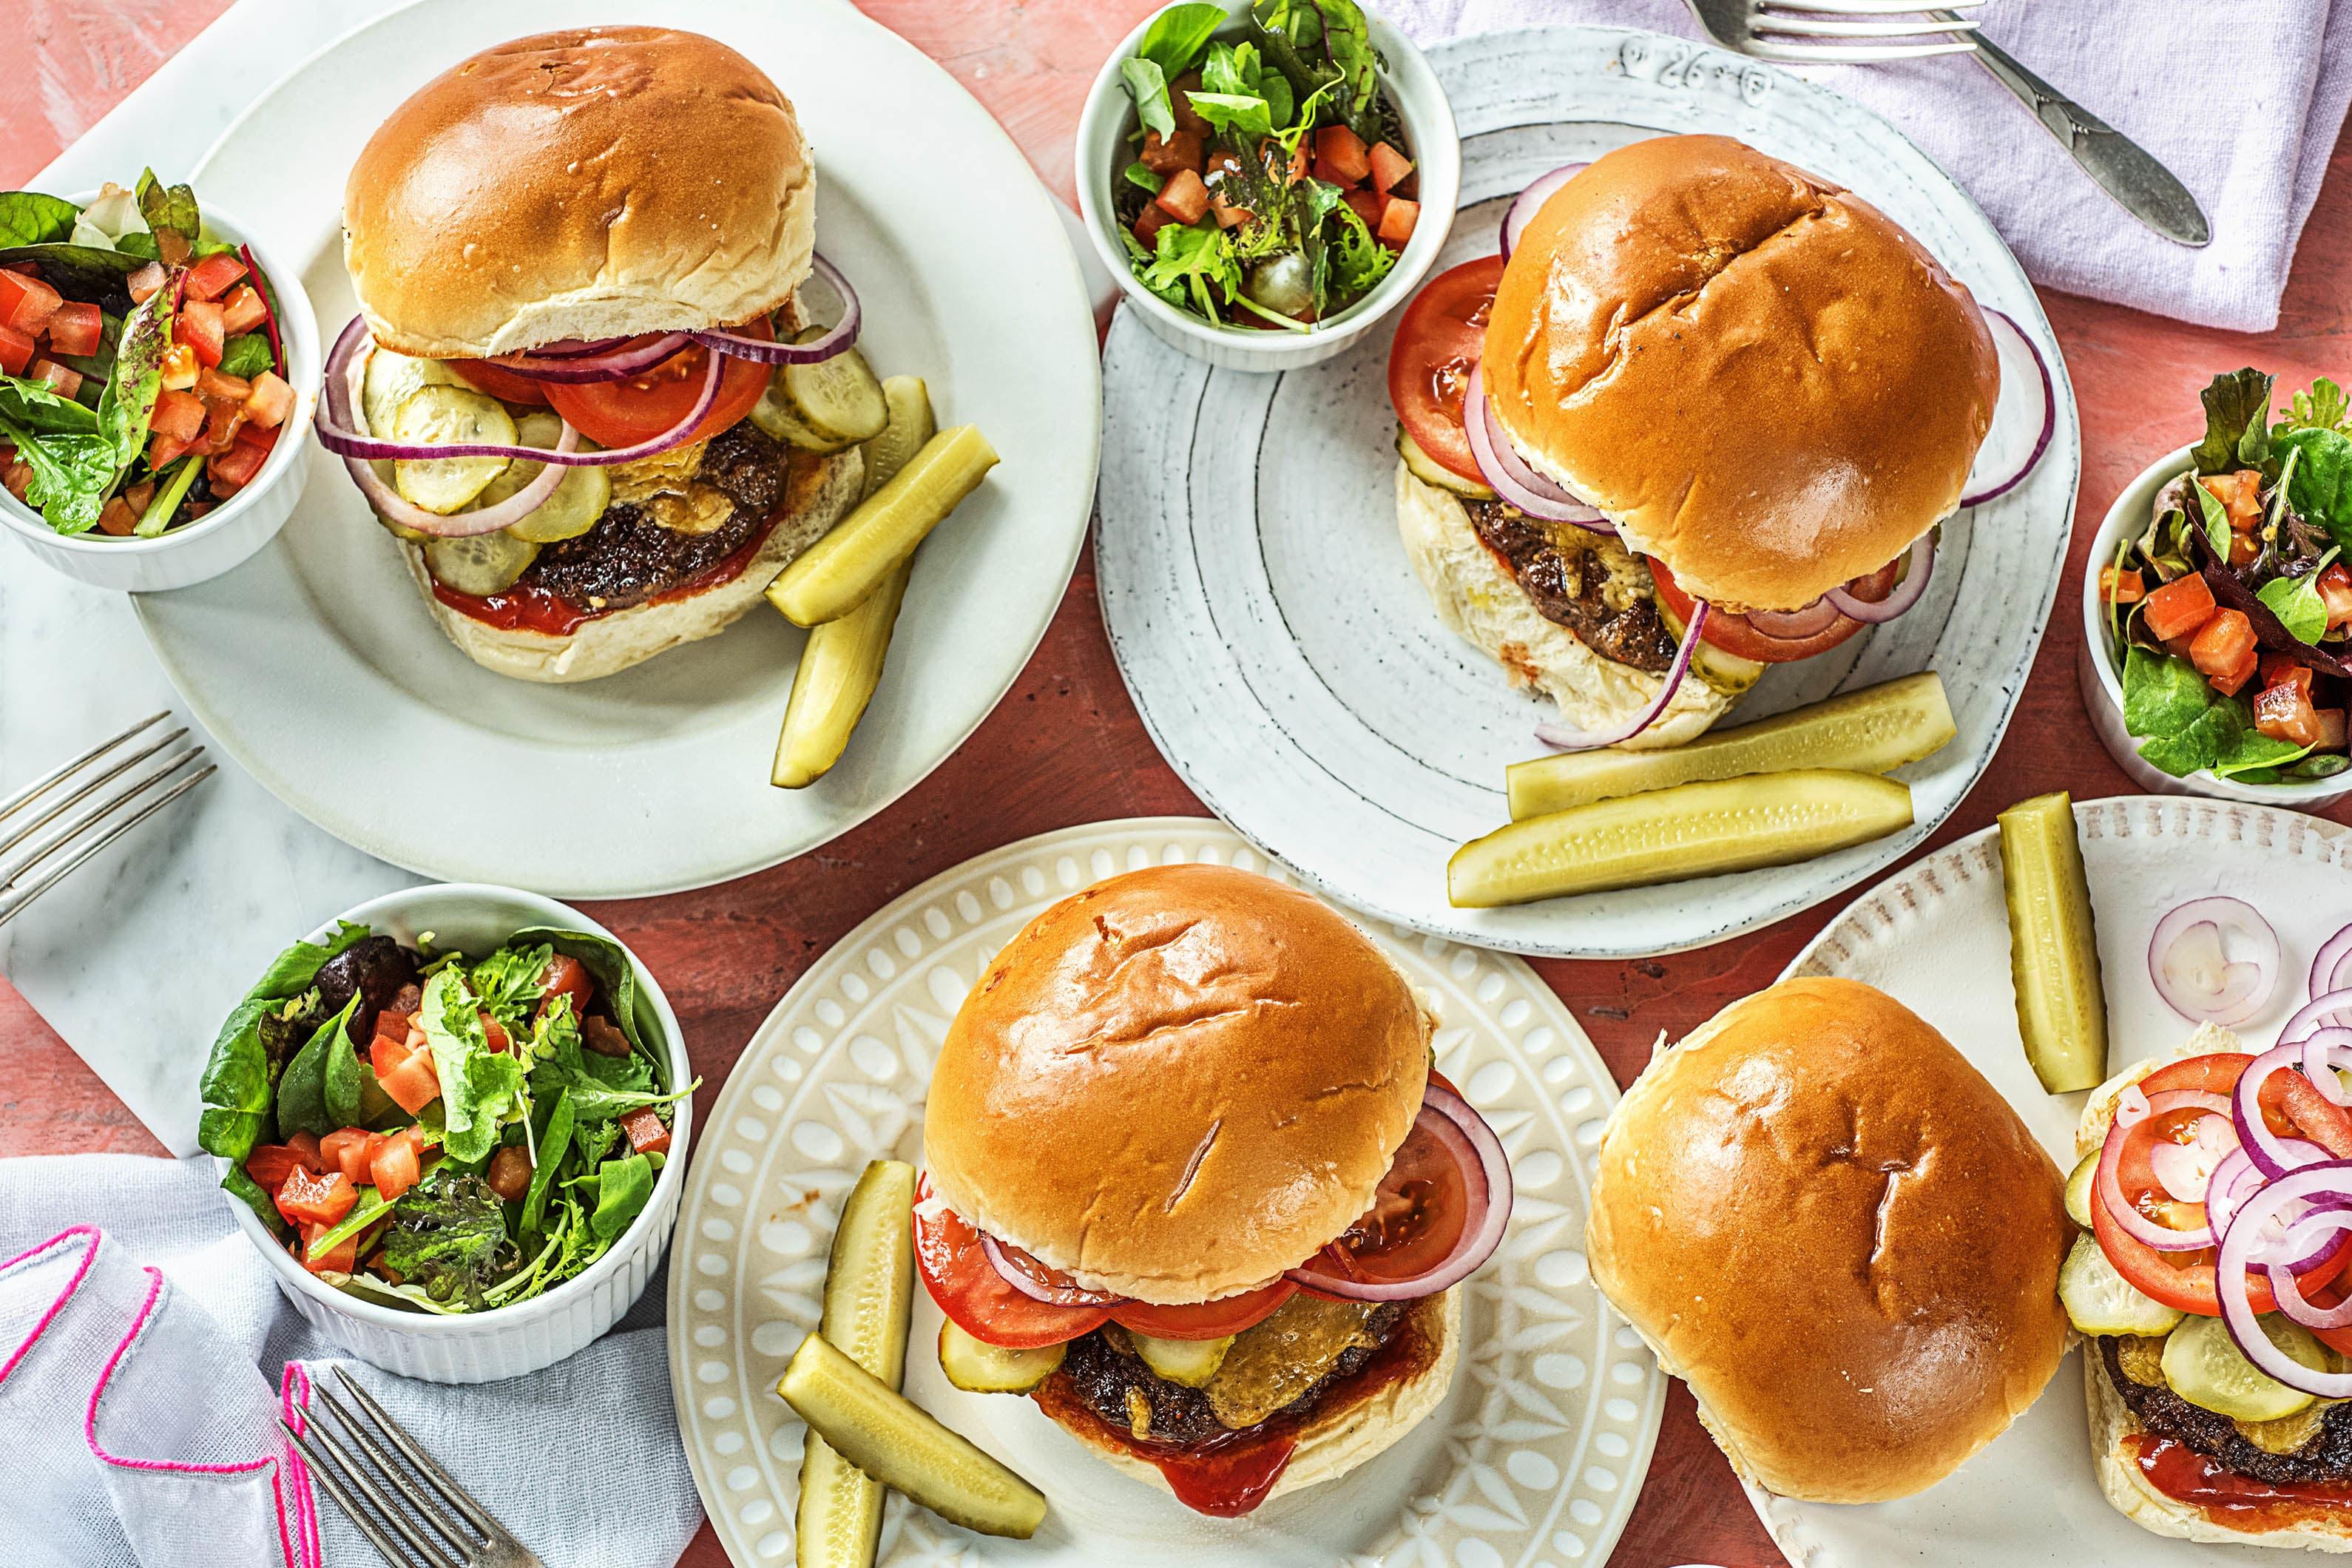 Cheddar Smash Burgers